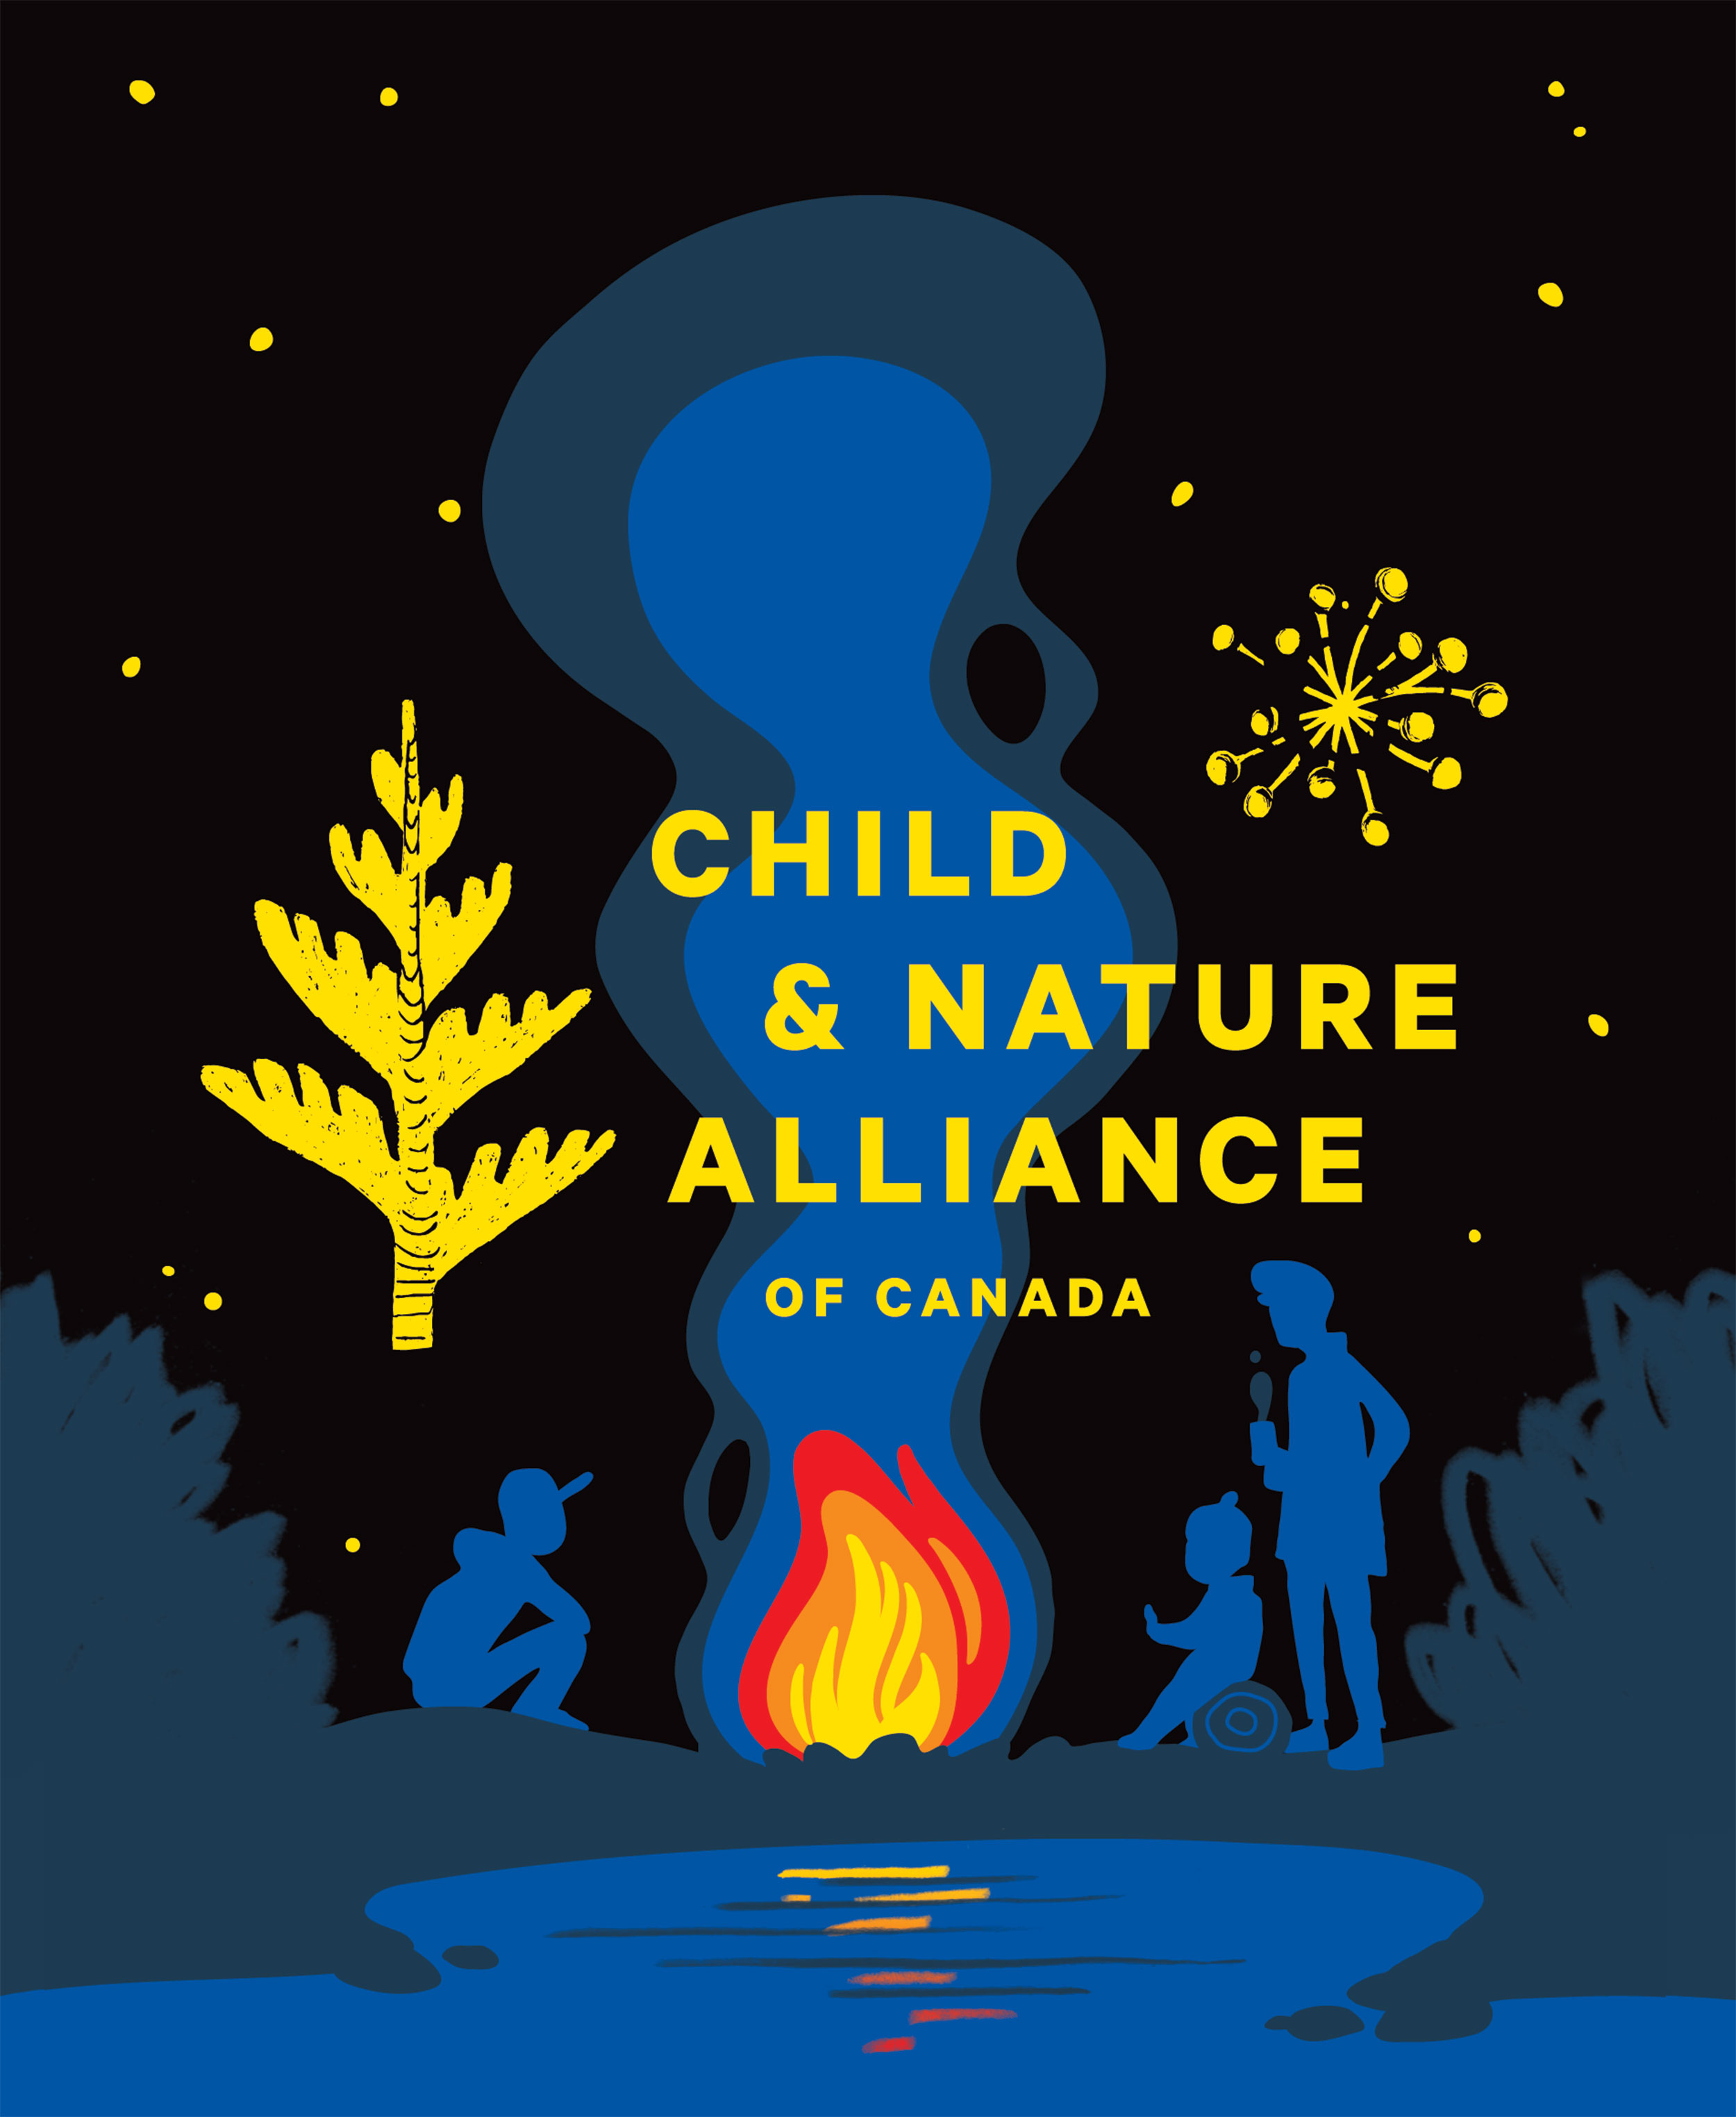 Jeff_Kulak-Child_and_Nature_Alliance_Canada01.jpg